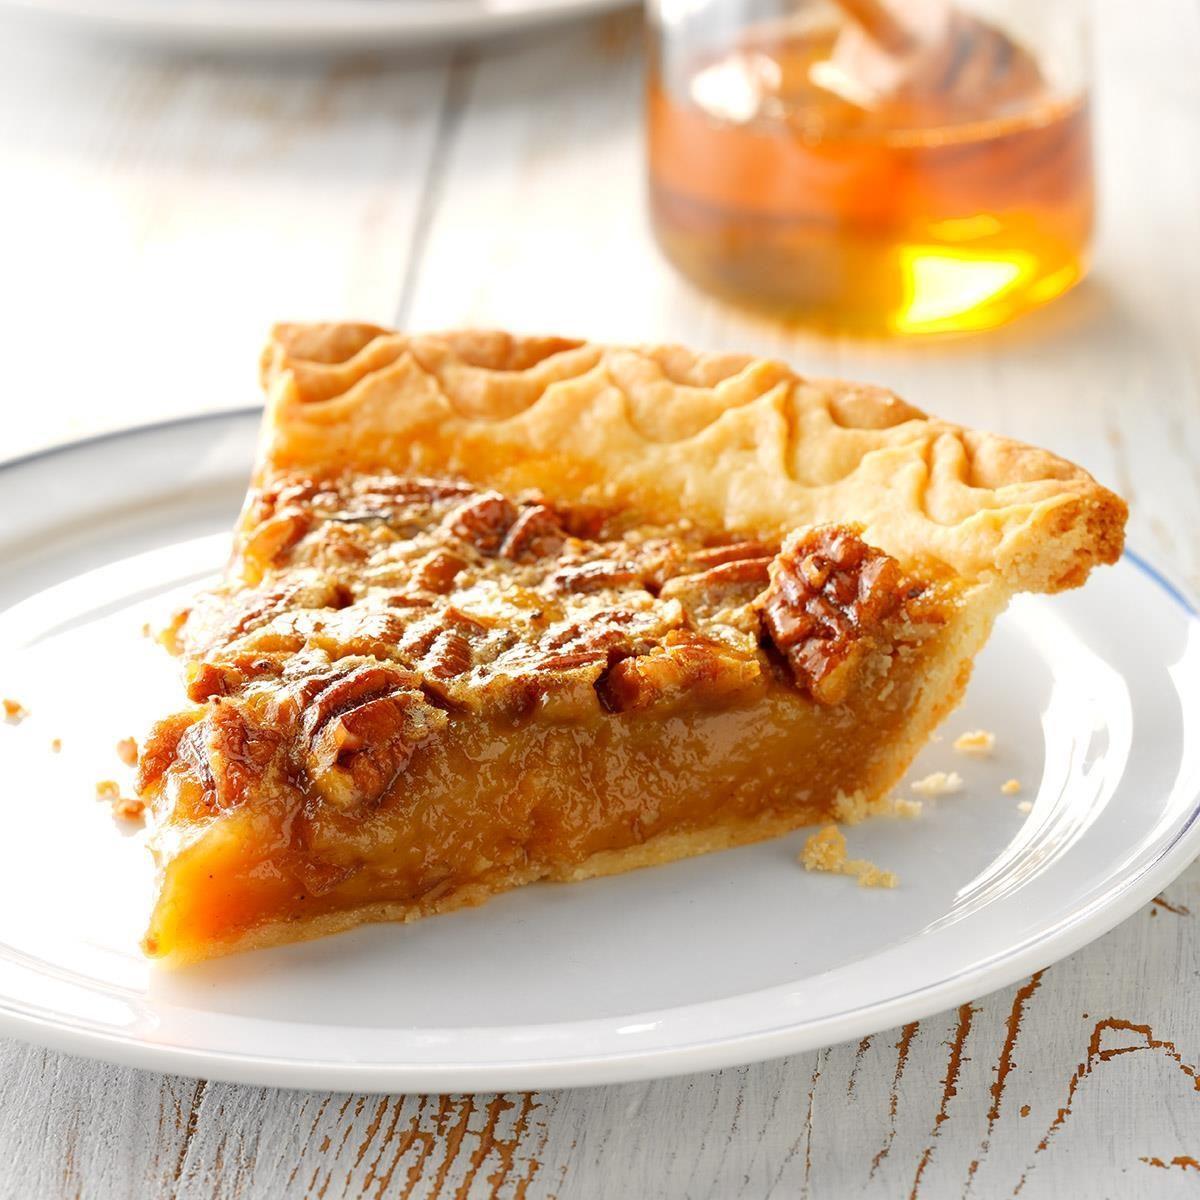 Connecticut: Honey Pie